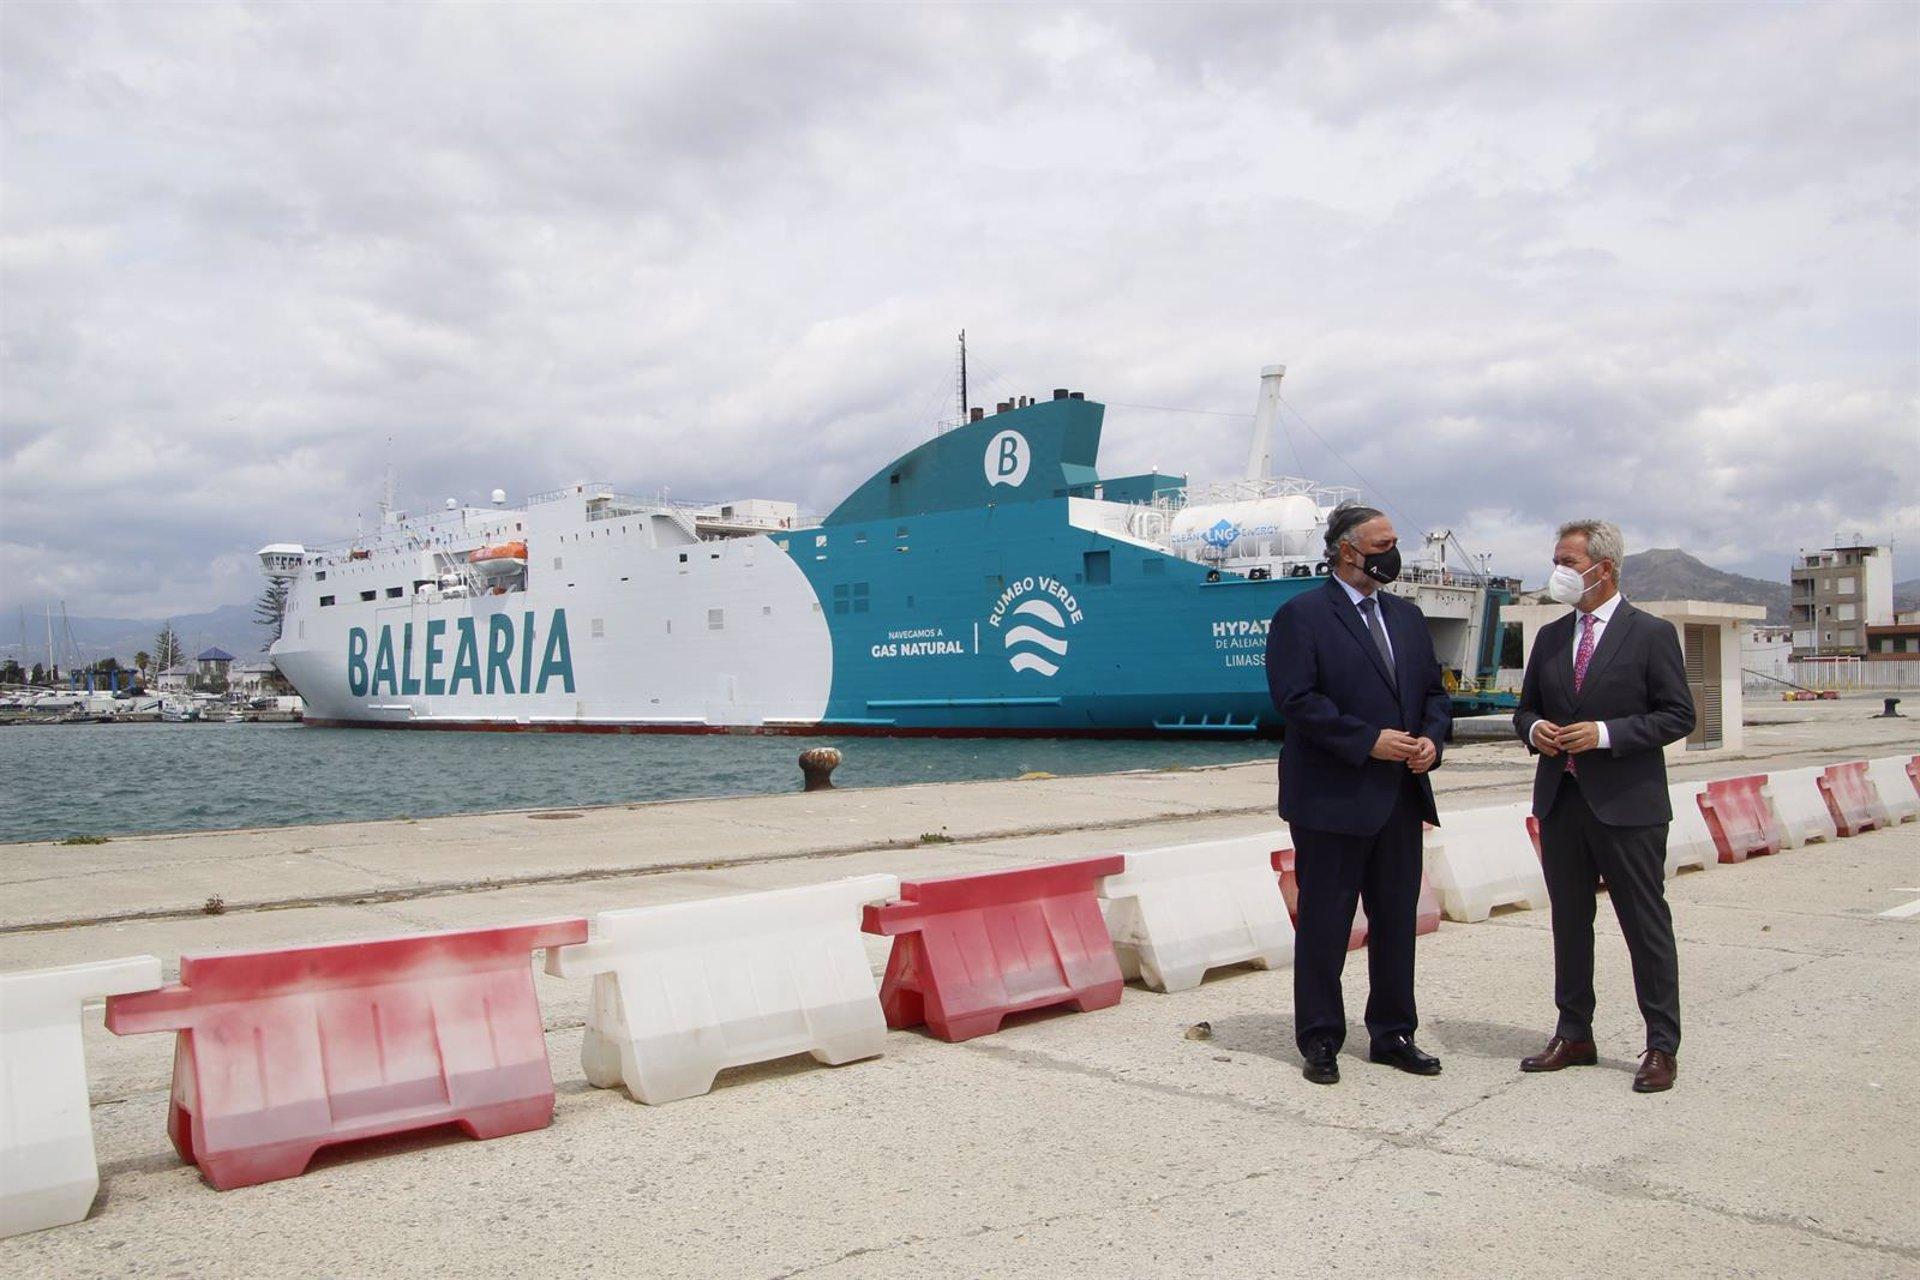 Motril suministra 2.700 toneladas de gas natural licuado desde la llegada de Balearia